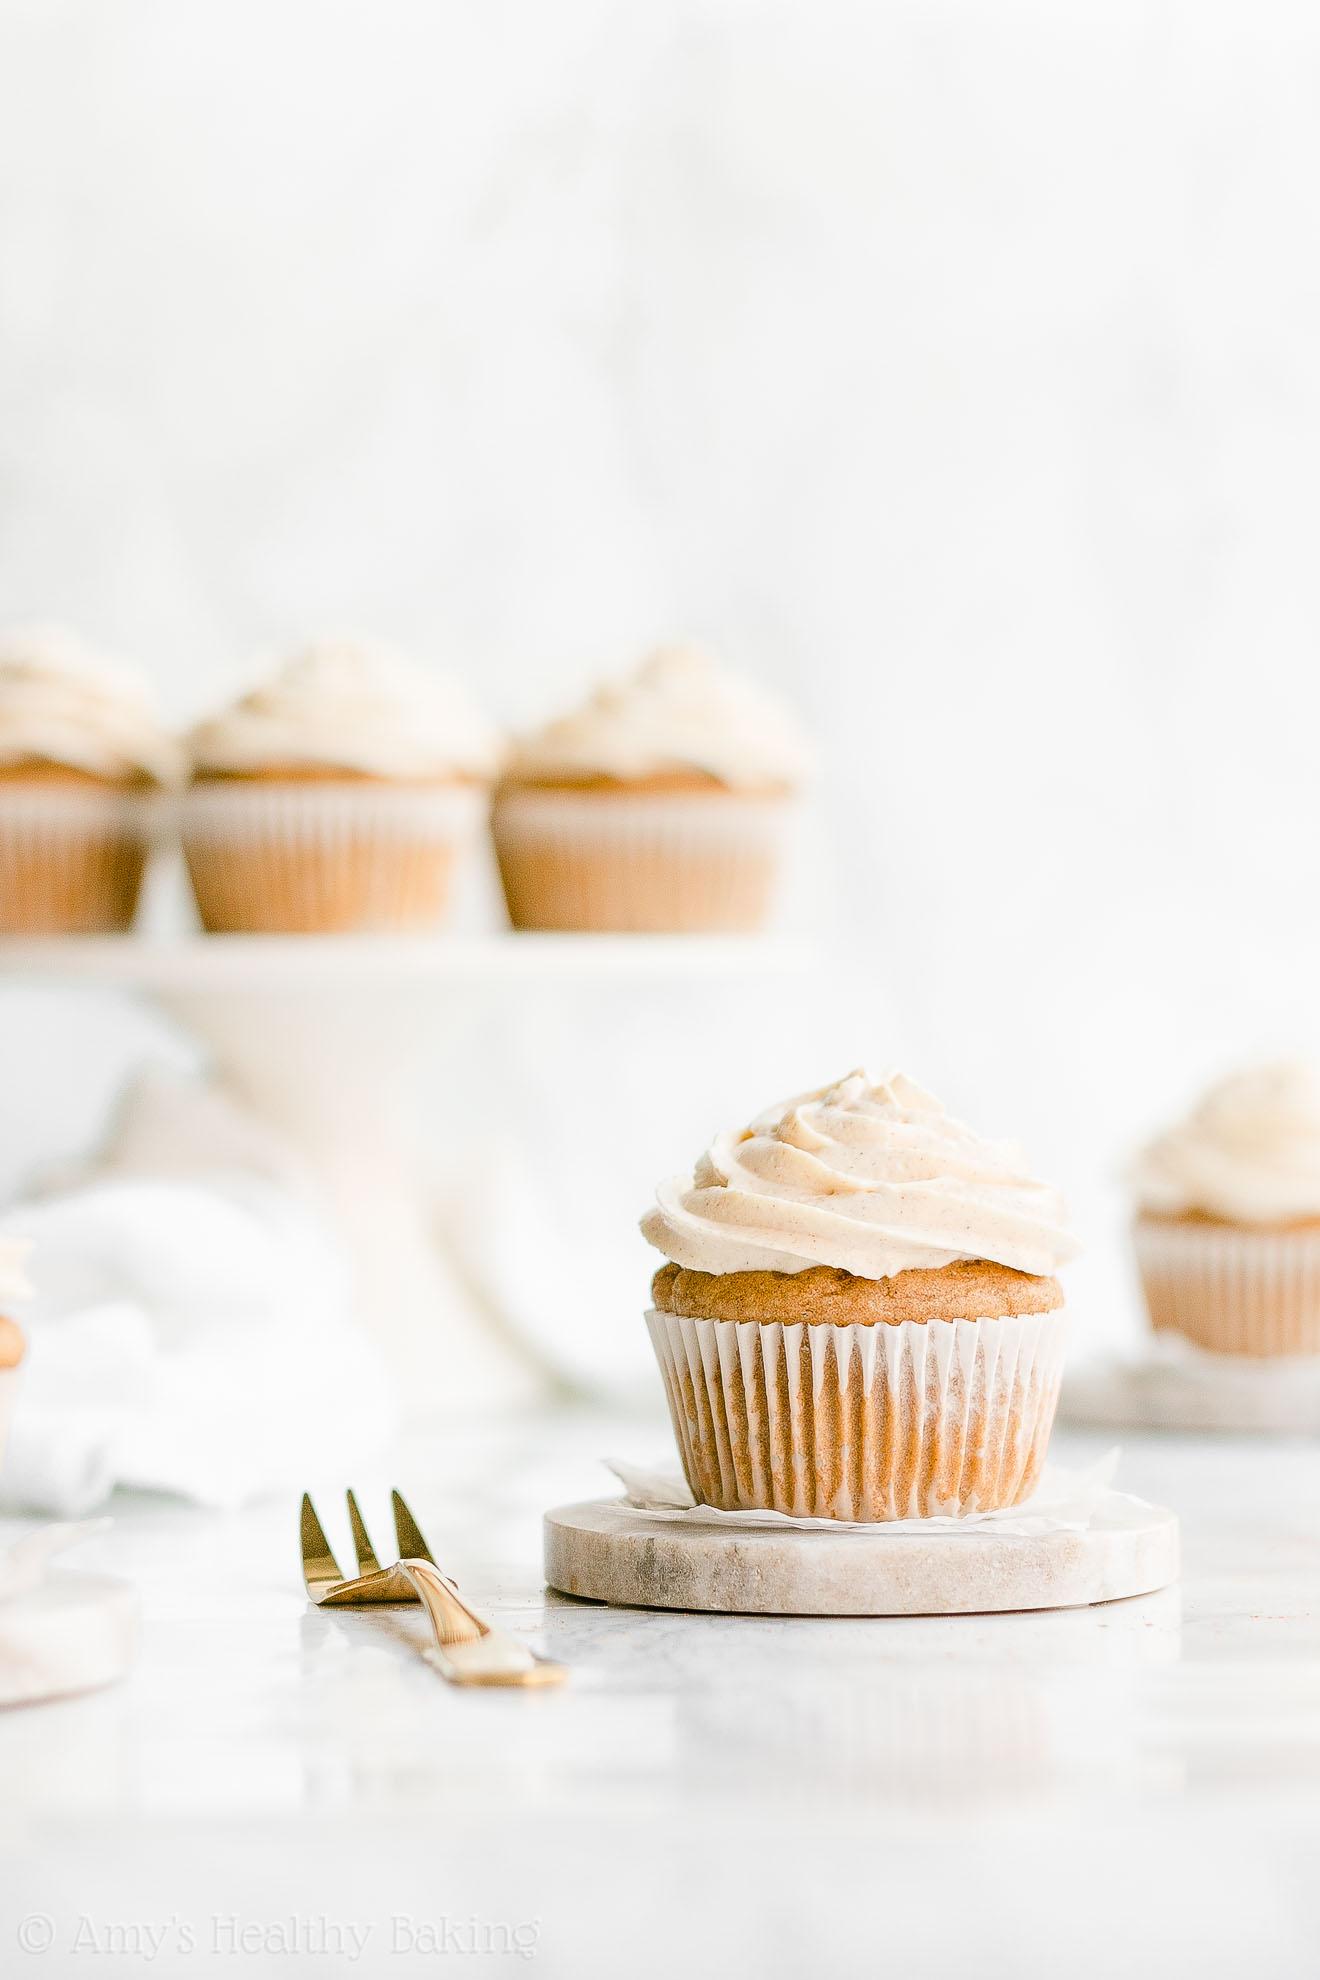 Easy Healthy Homemade Moist & Tender Holiday Eggnog Cupcakes